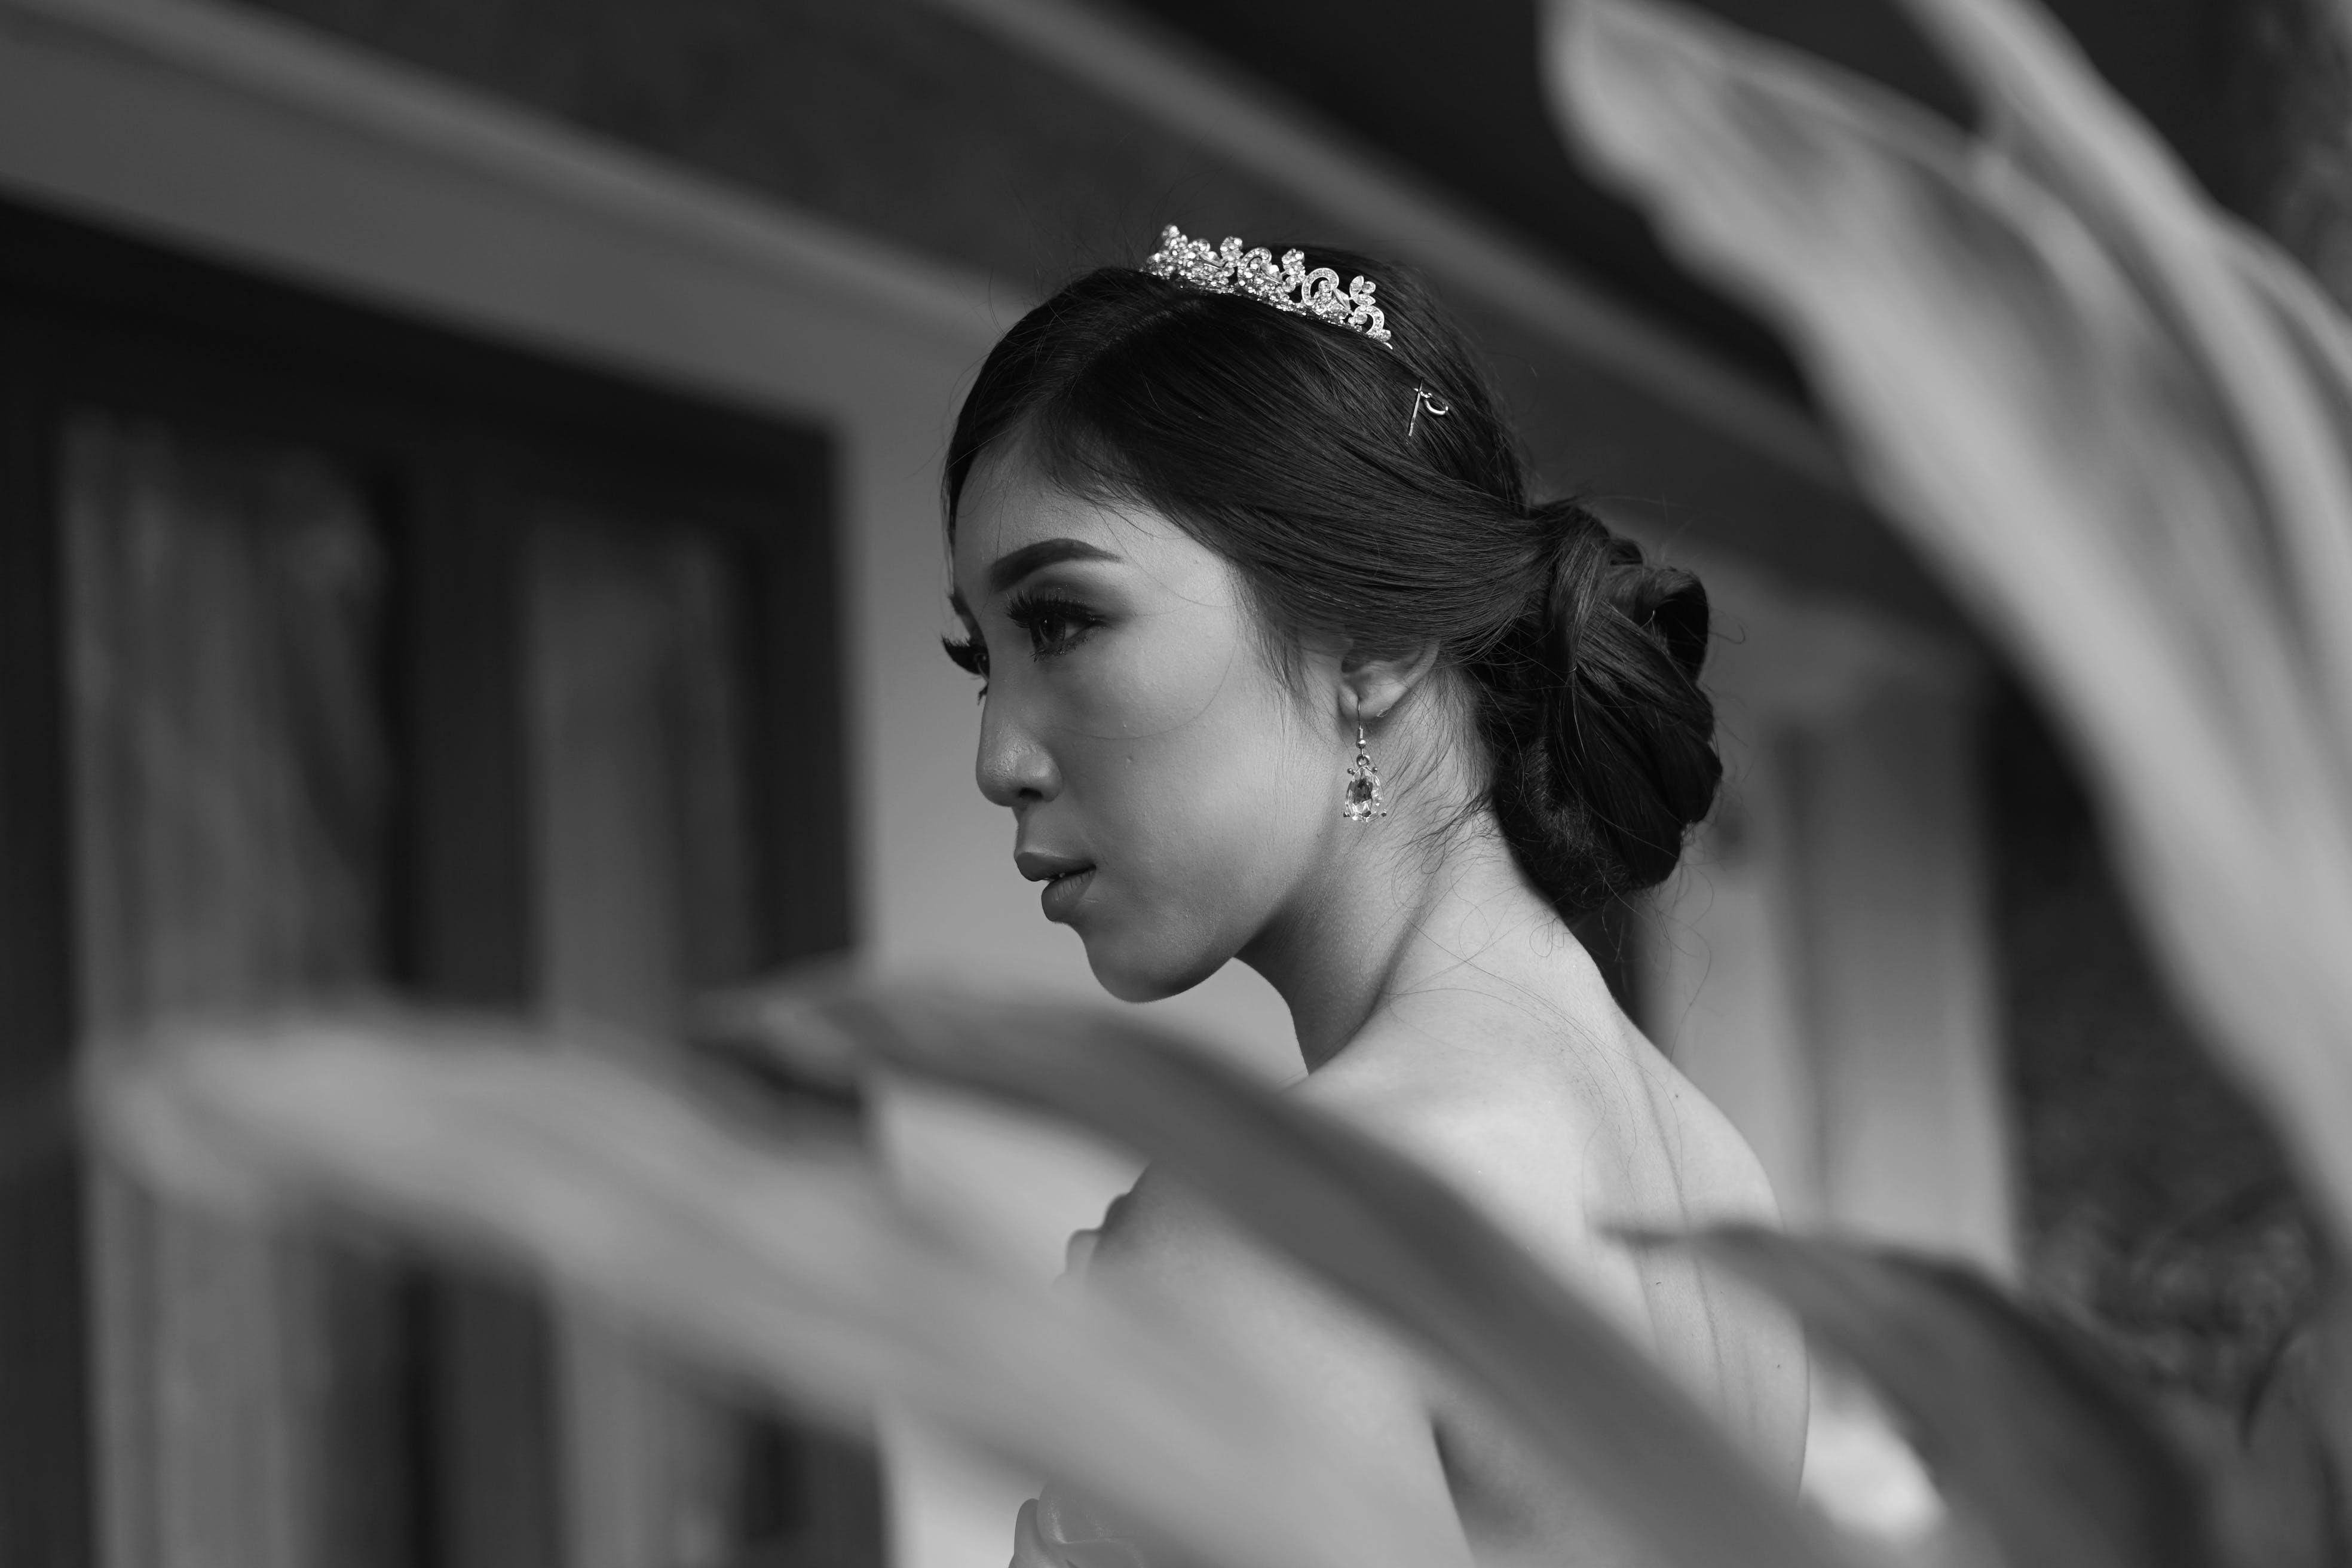 Monochrome Photo of Woman Wearing Tiara